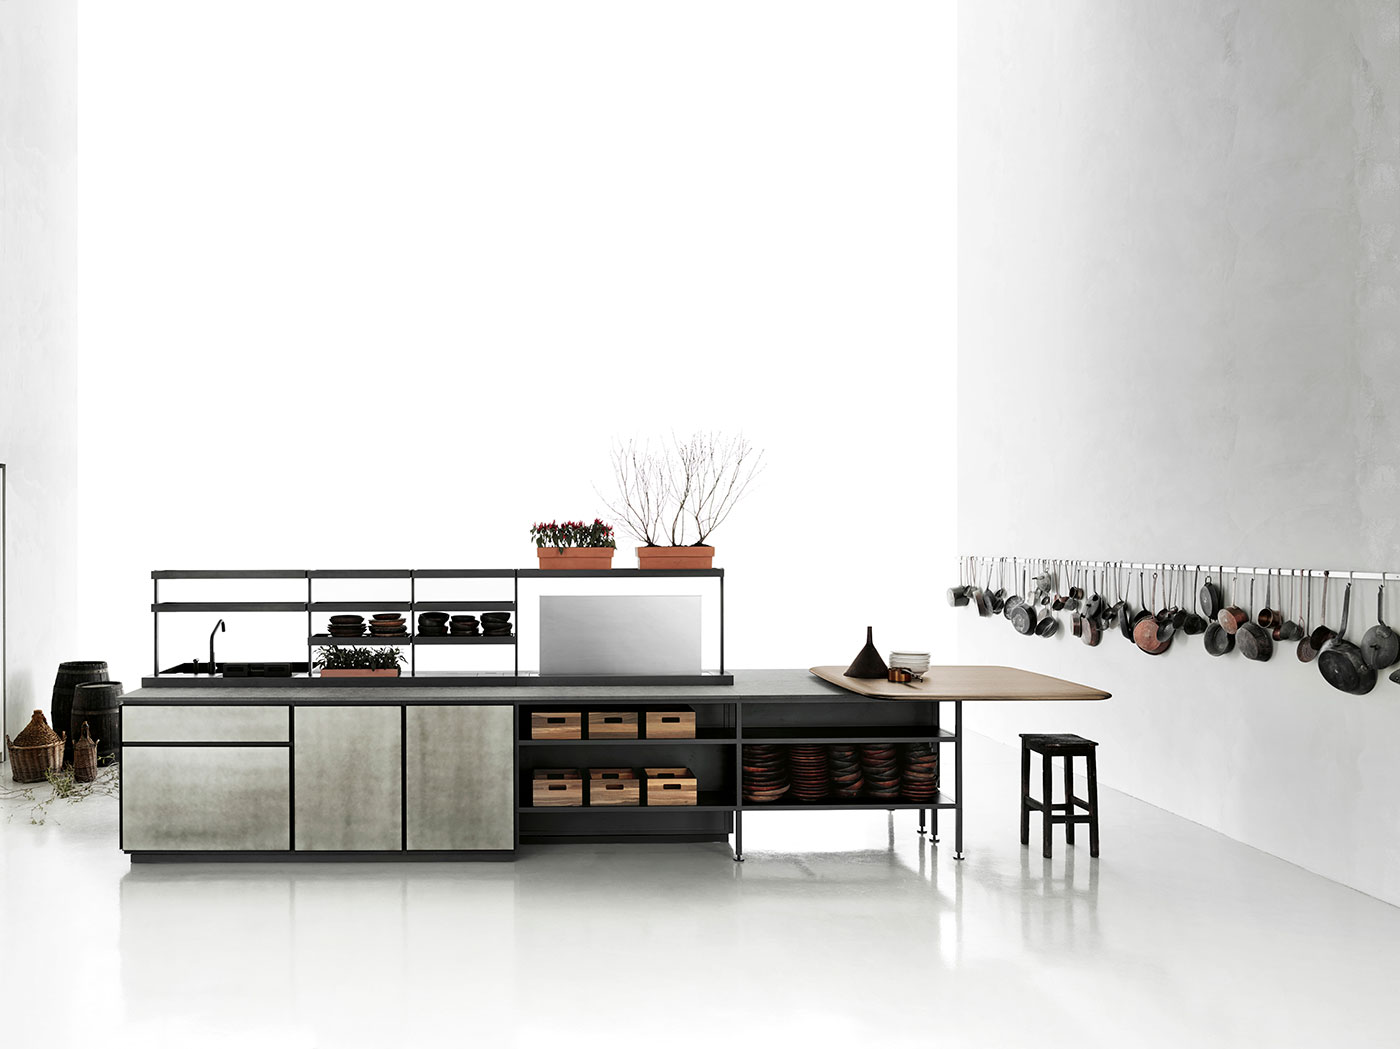 Obegi Home Boffi Salinas kitchen By Tommasosartori High